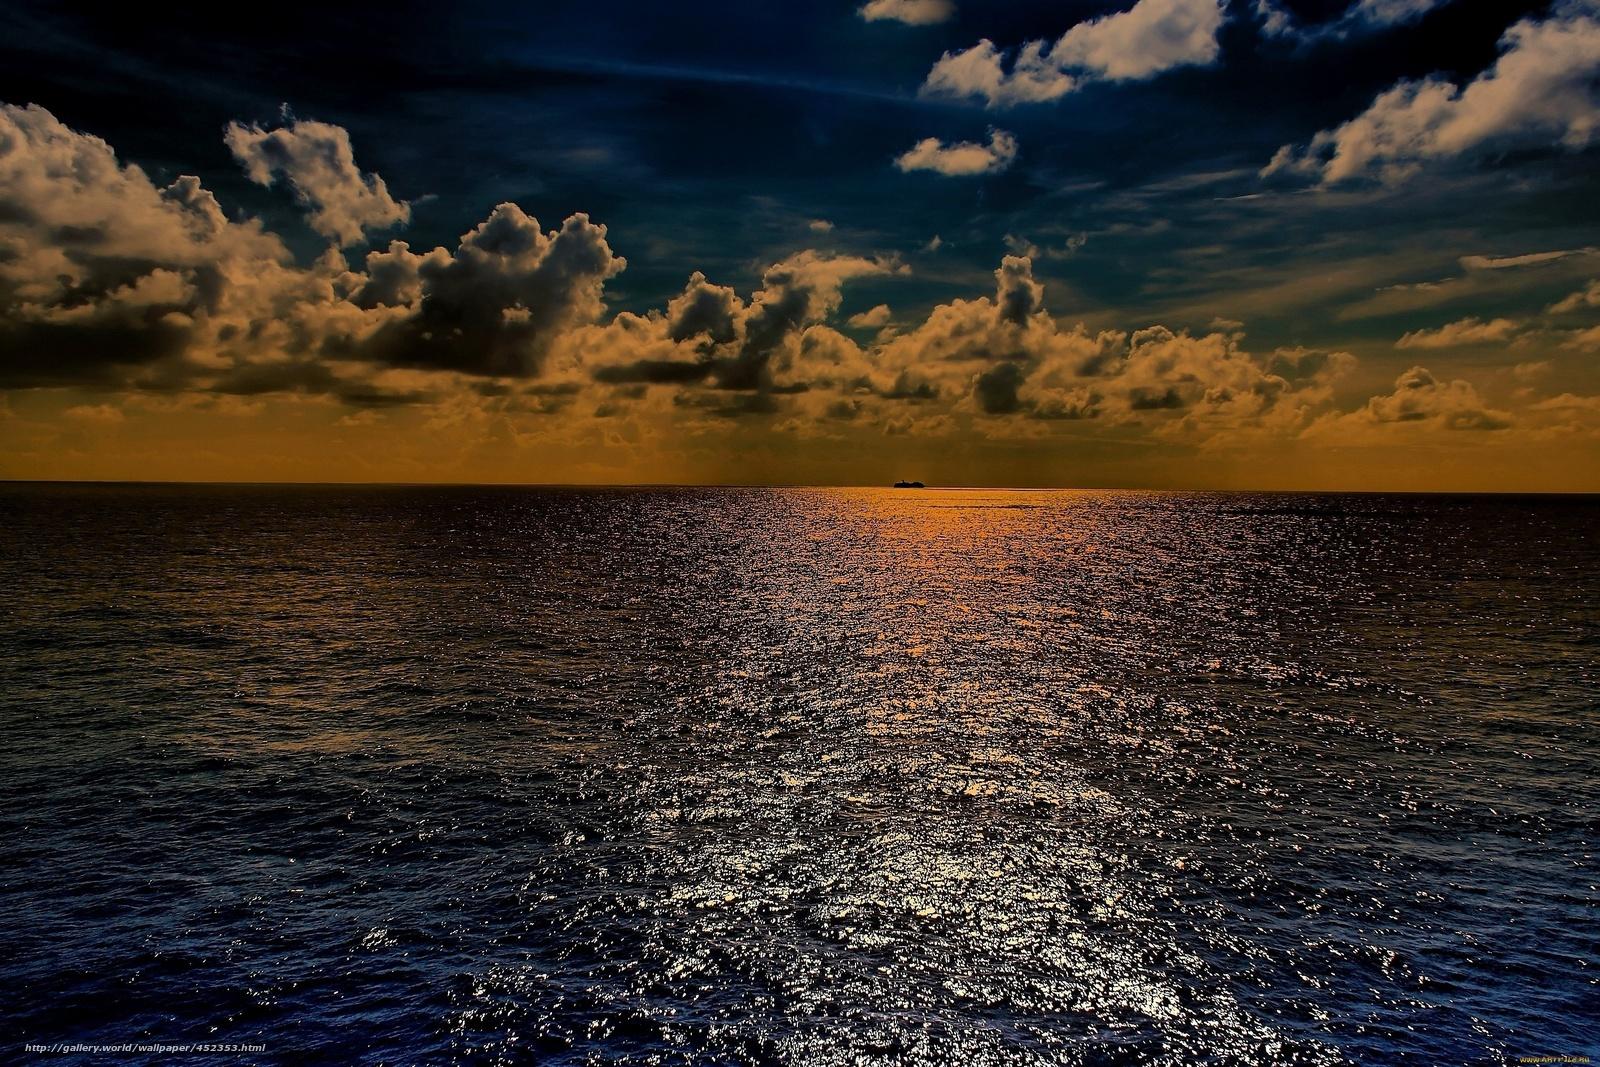 Download wallpaper sea clouds Sunrise desktop wallpaper in the 1600x1067